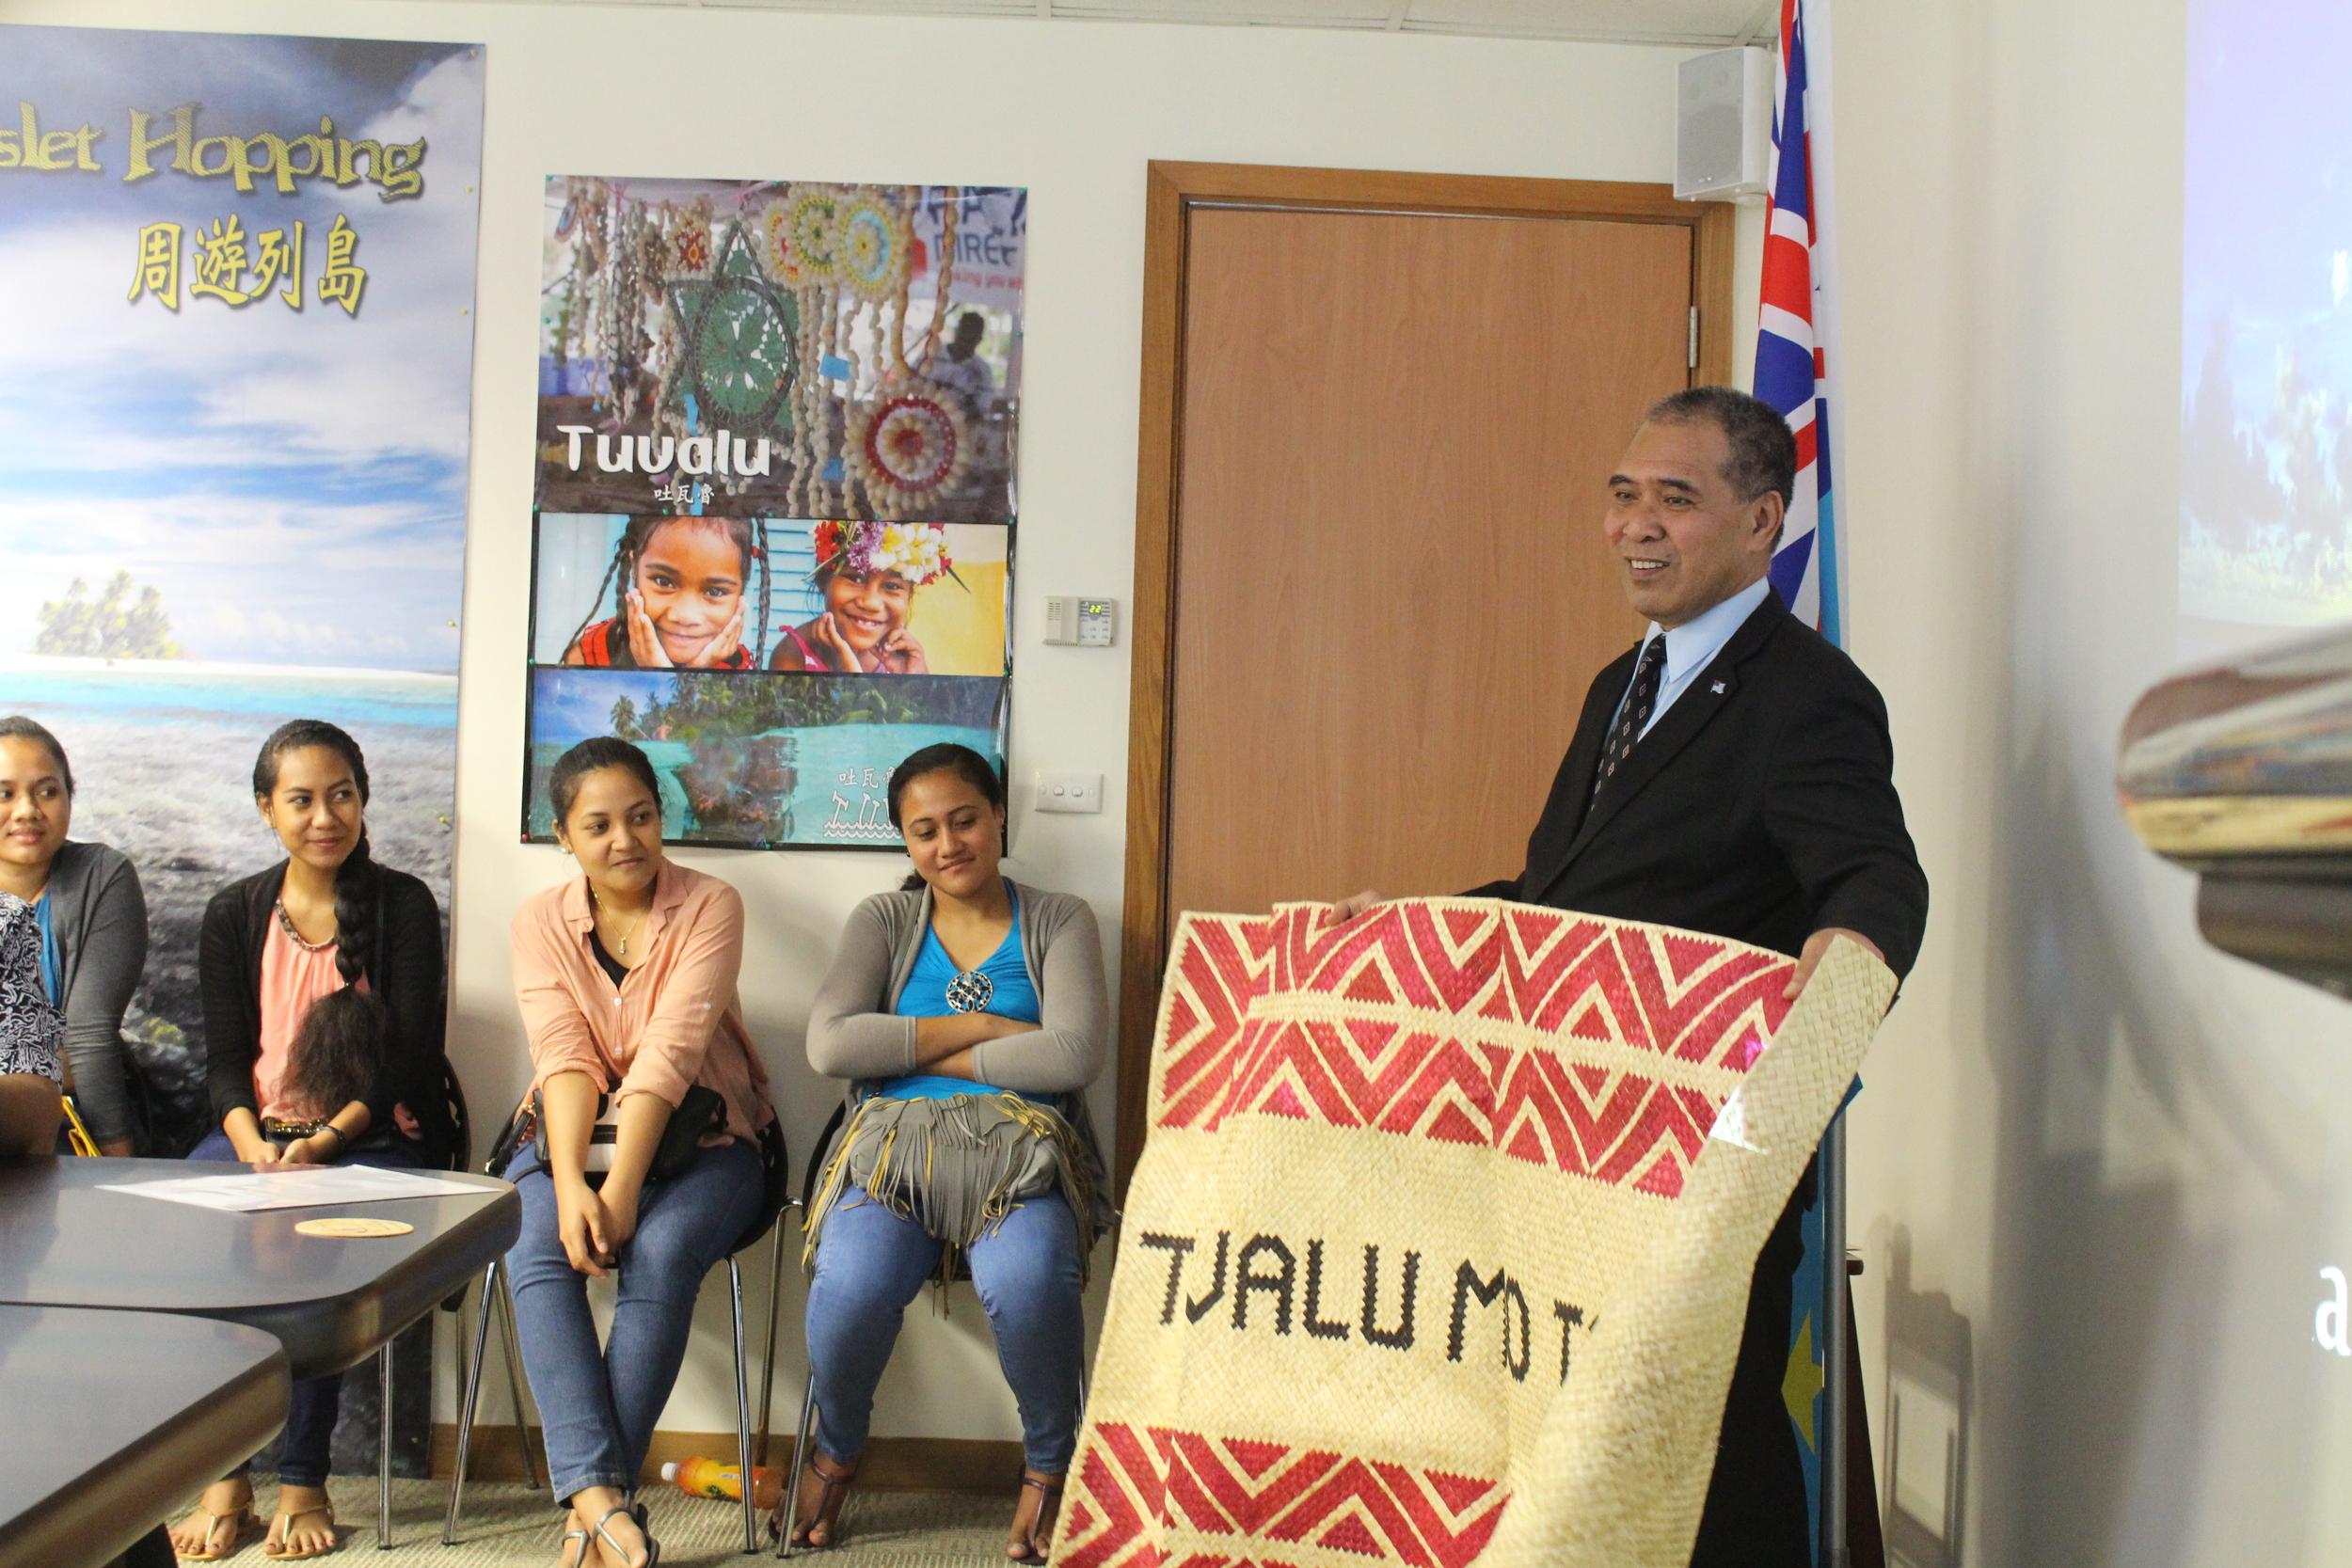 Ambassador Taupo with a gift presented by the delegation/陶敏德大使獲贈代表團所贈送之傳統草蓆